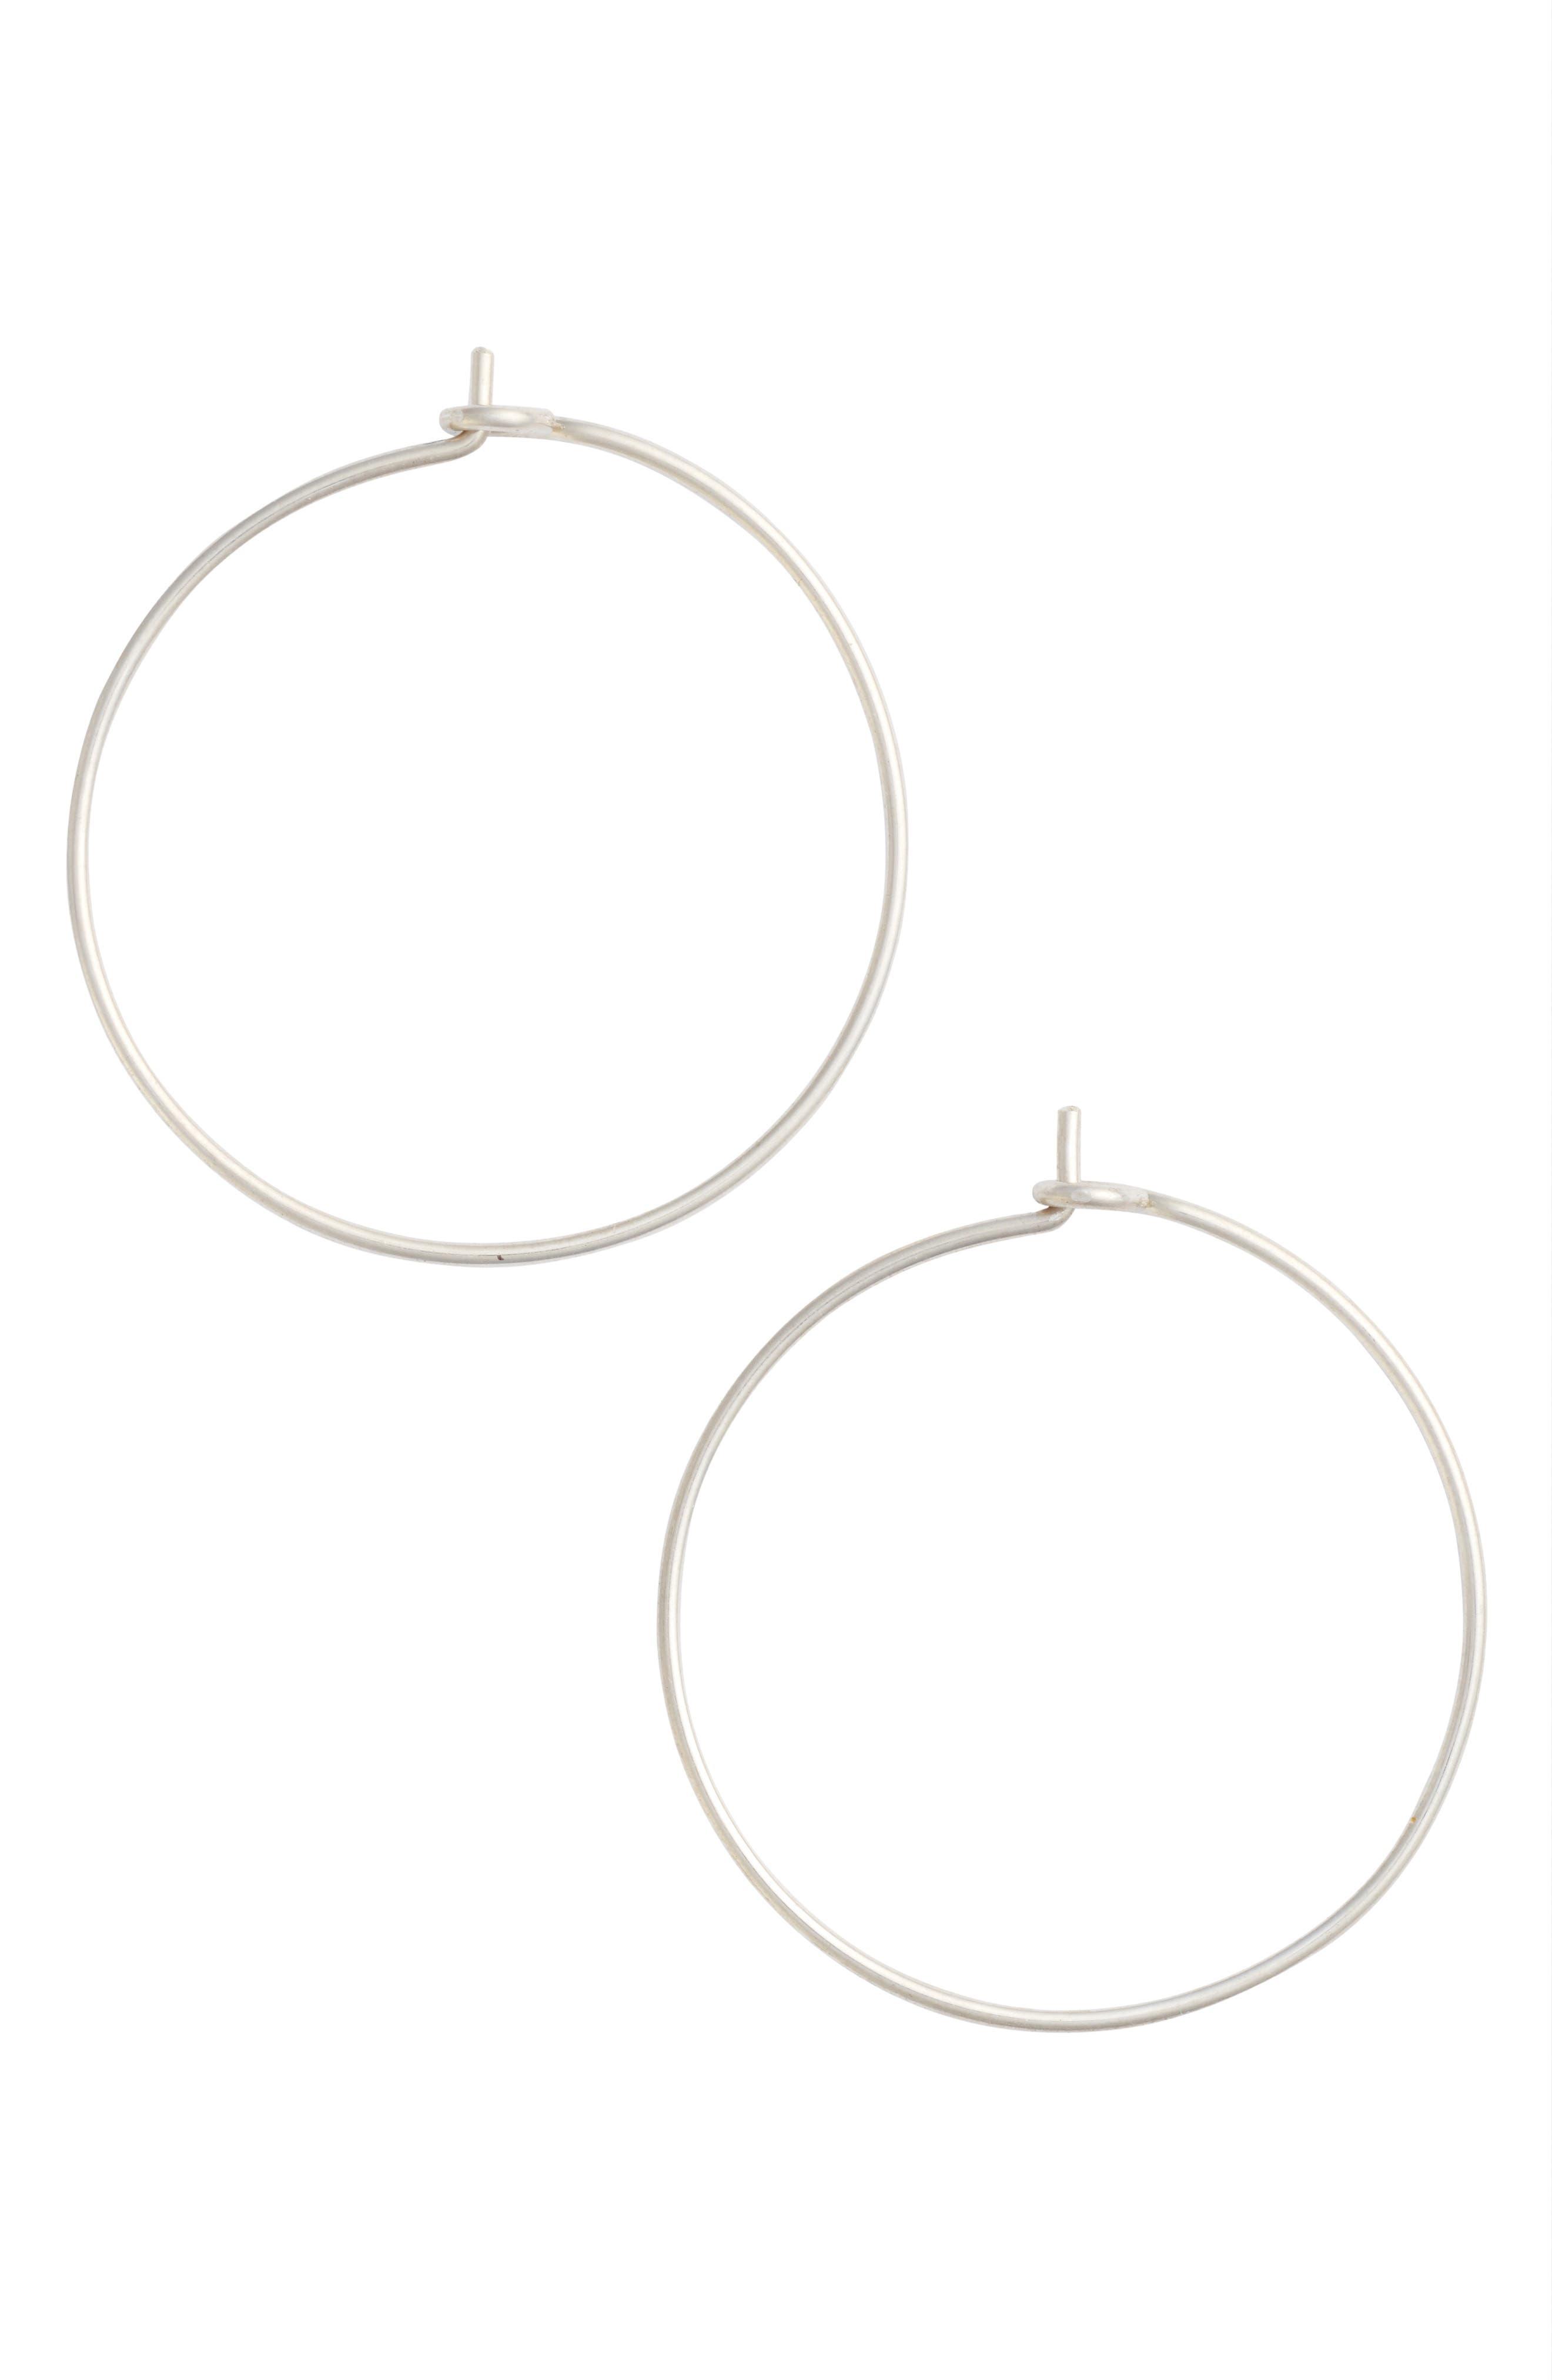 Medium Pure Hoop Earrings,                         Main,                         color, Silver